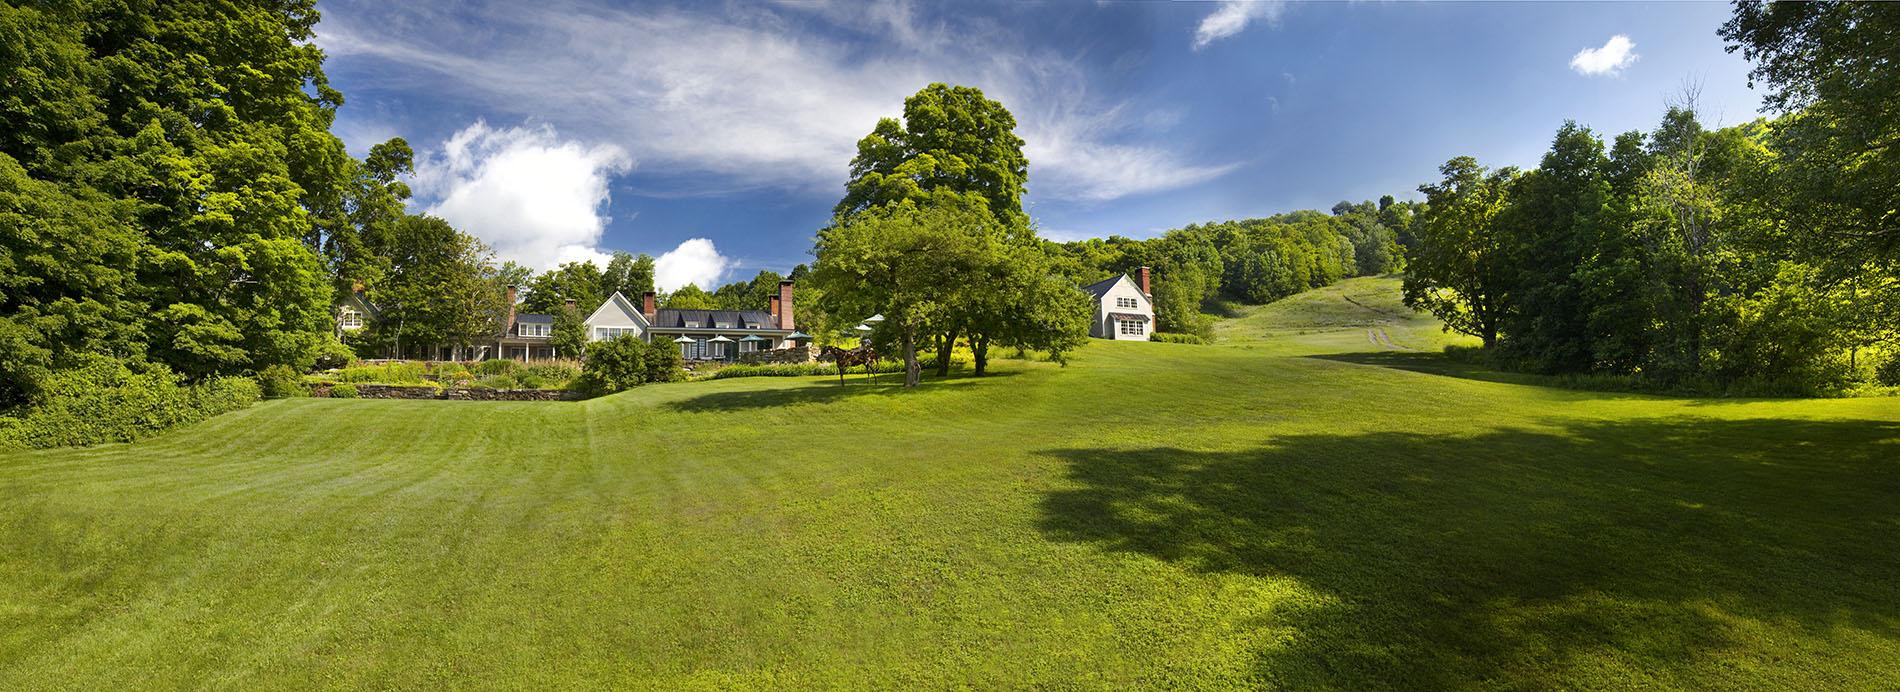 Twin Farms Resort in Barnard, Vermont